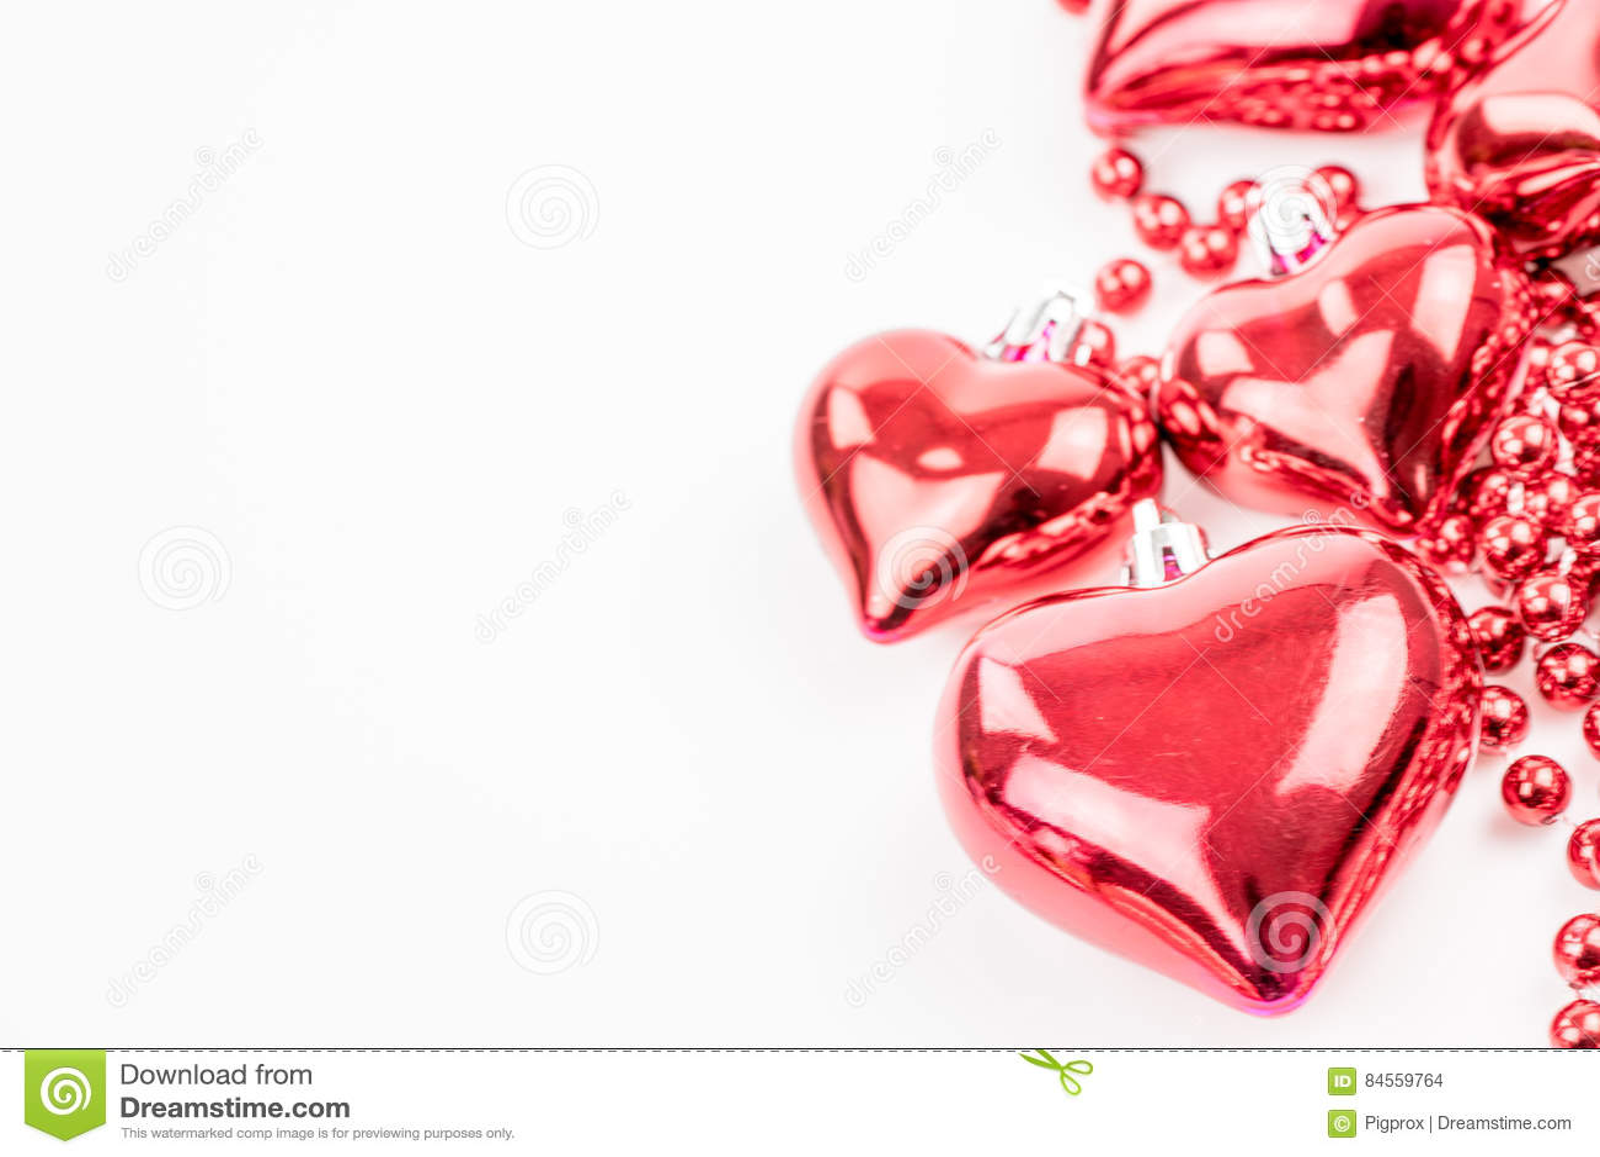 Red Heart Shapes Vector Illustration